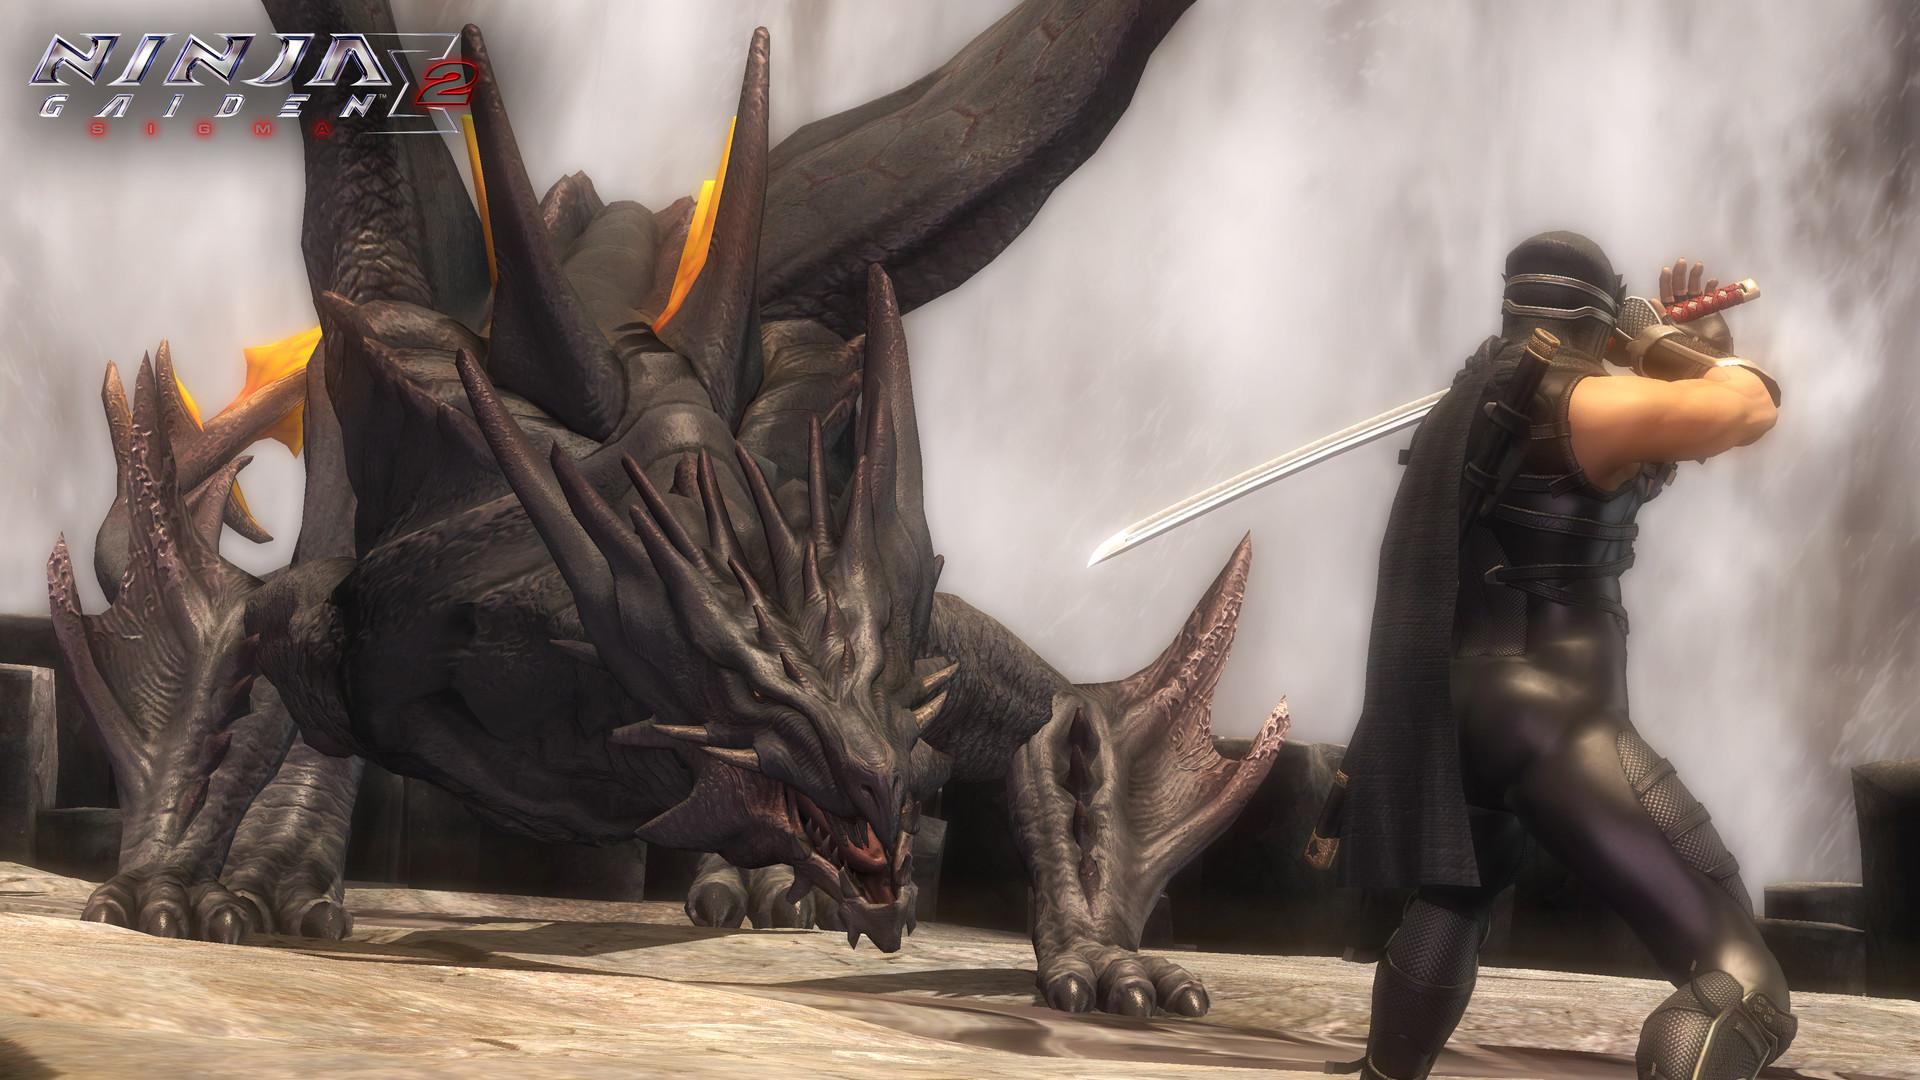 ninja-gaiden-sigma-2-pc-screenshot-1